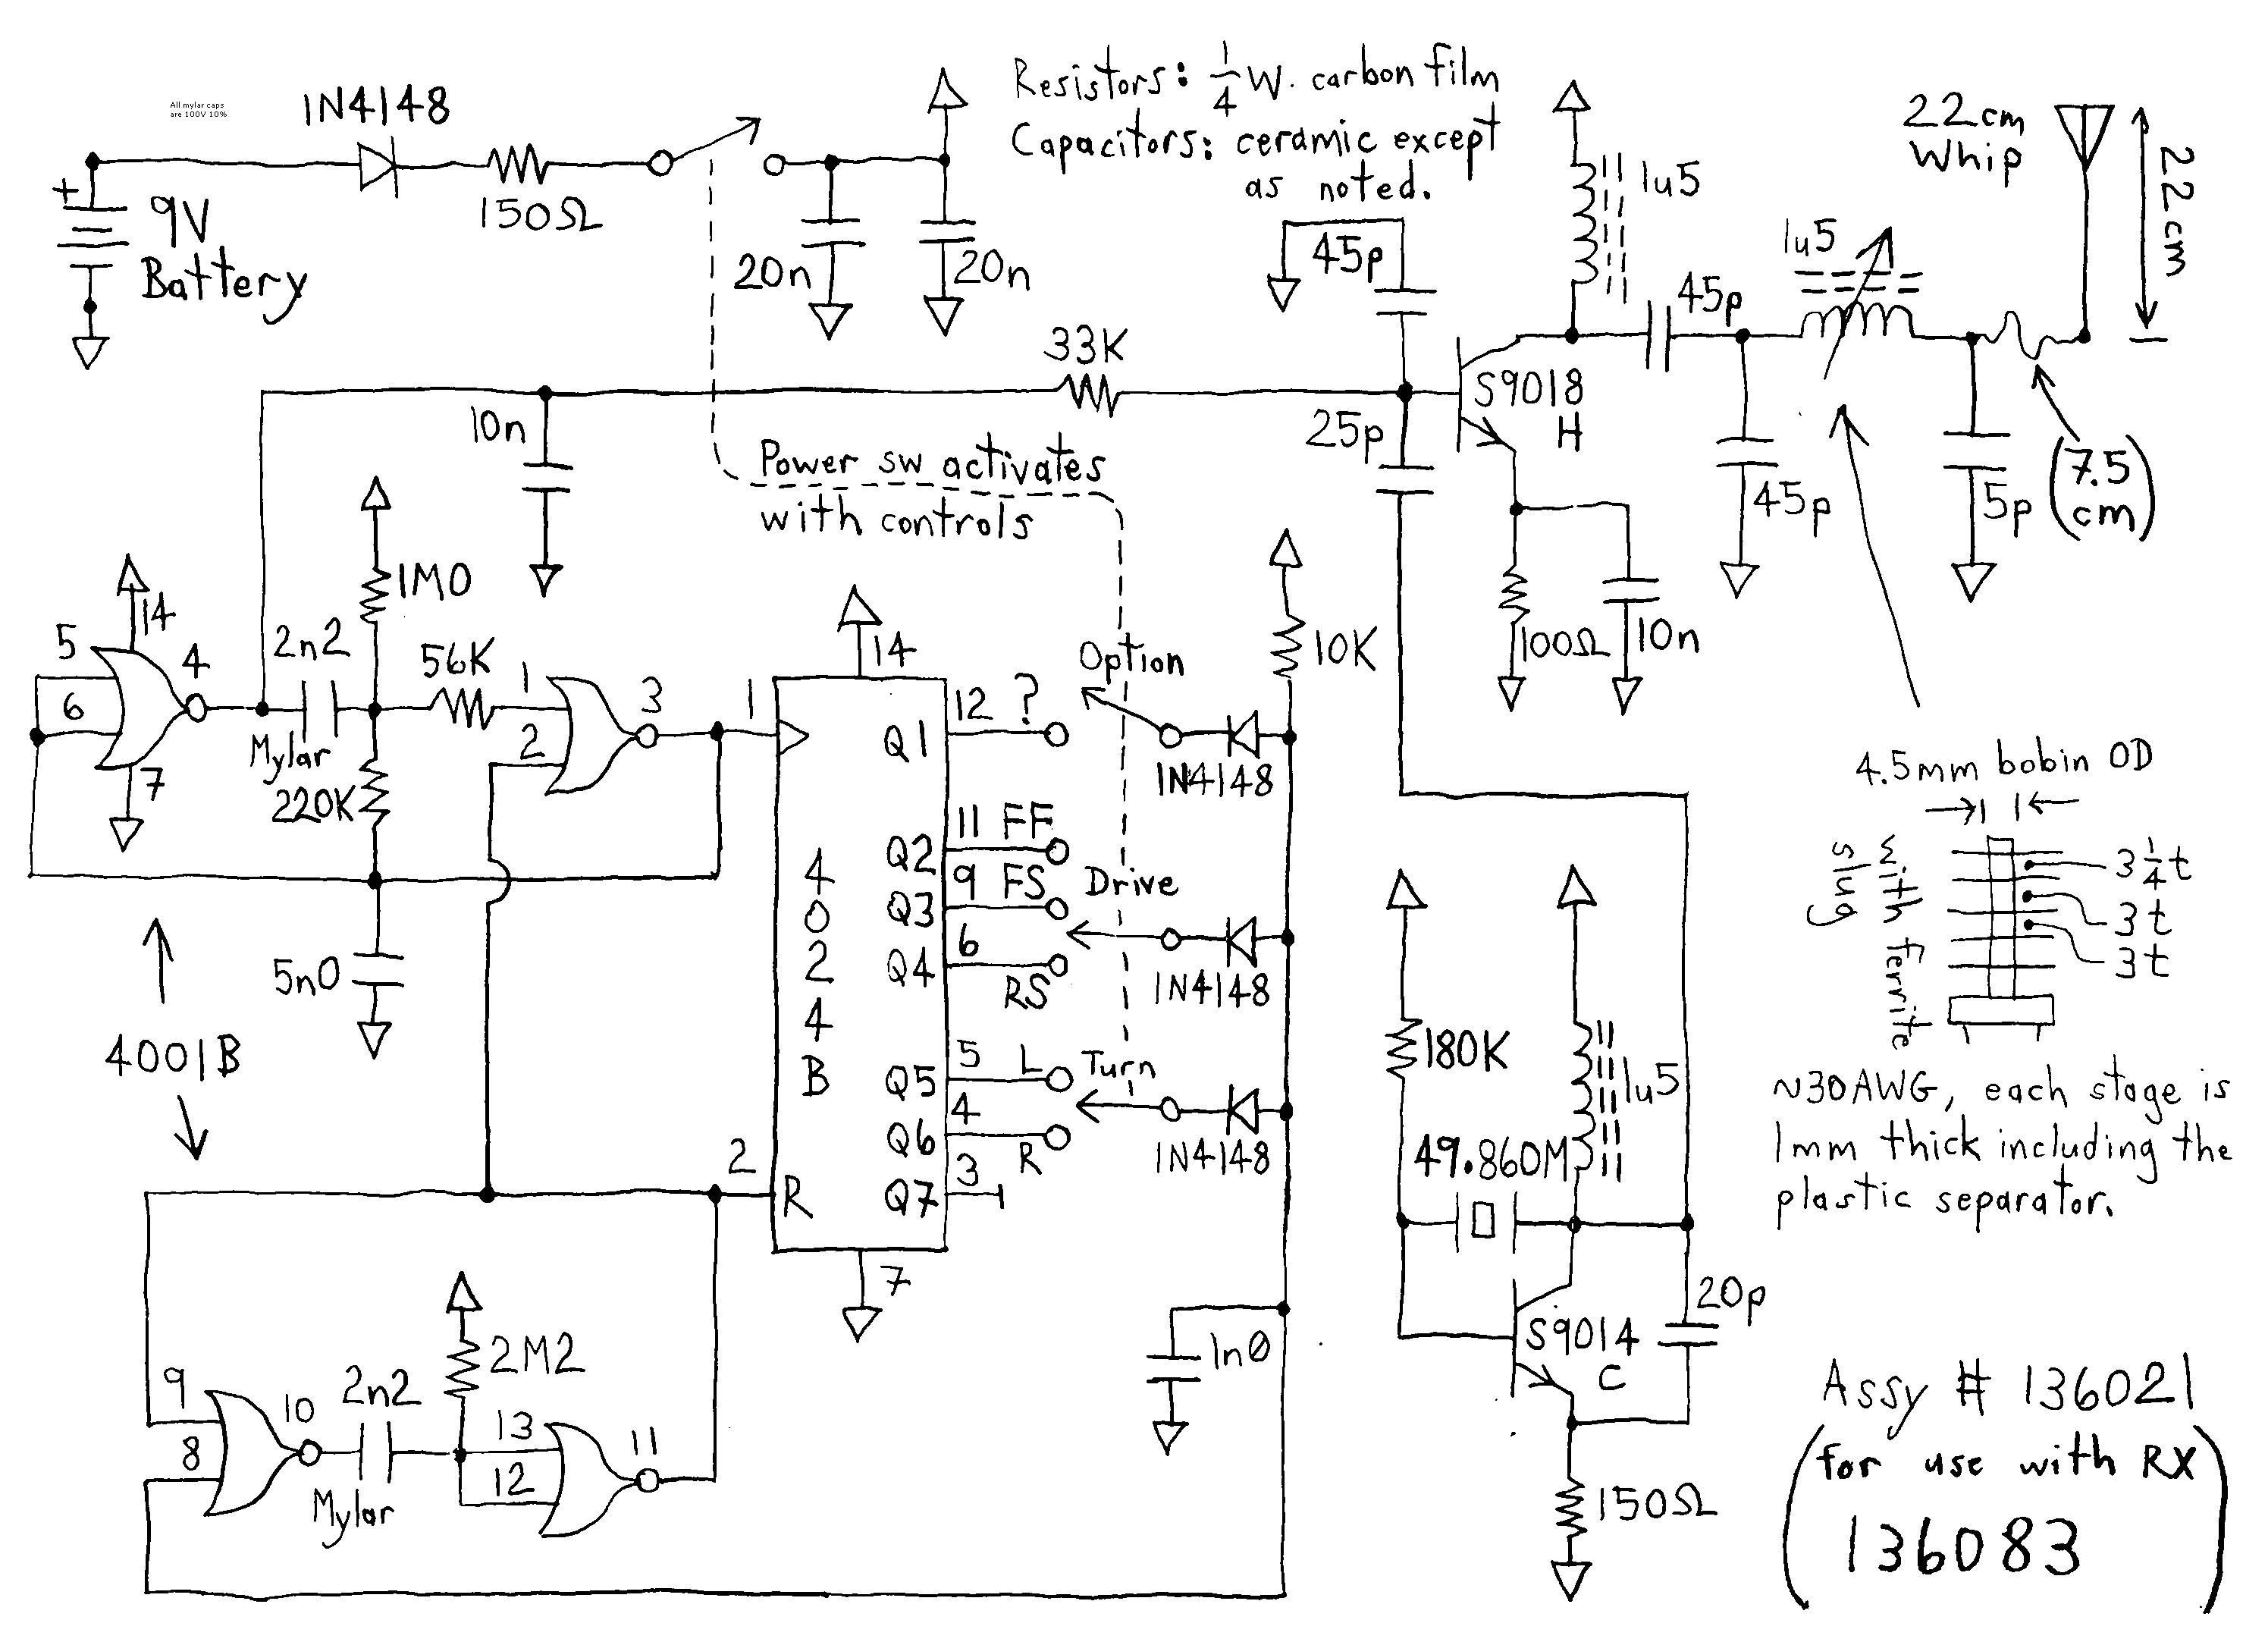 mercial Electrical Diagram